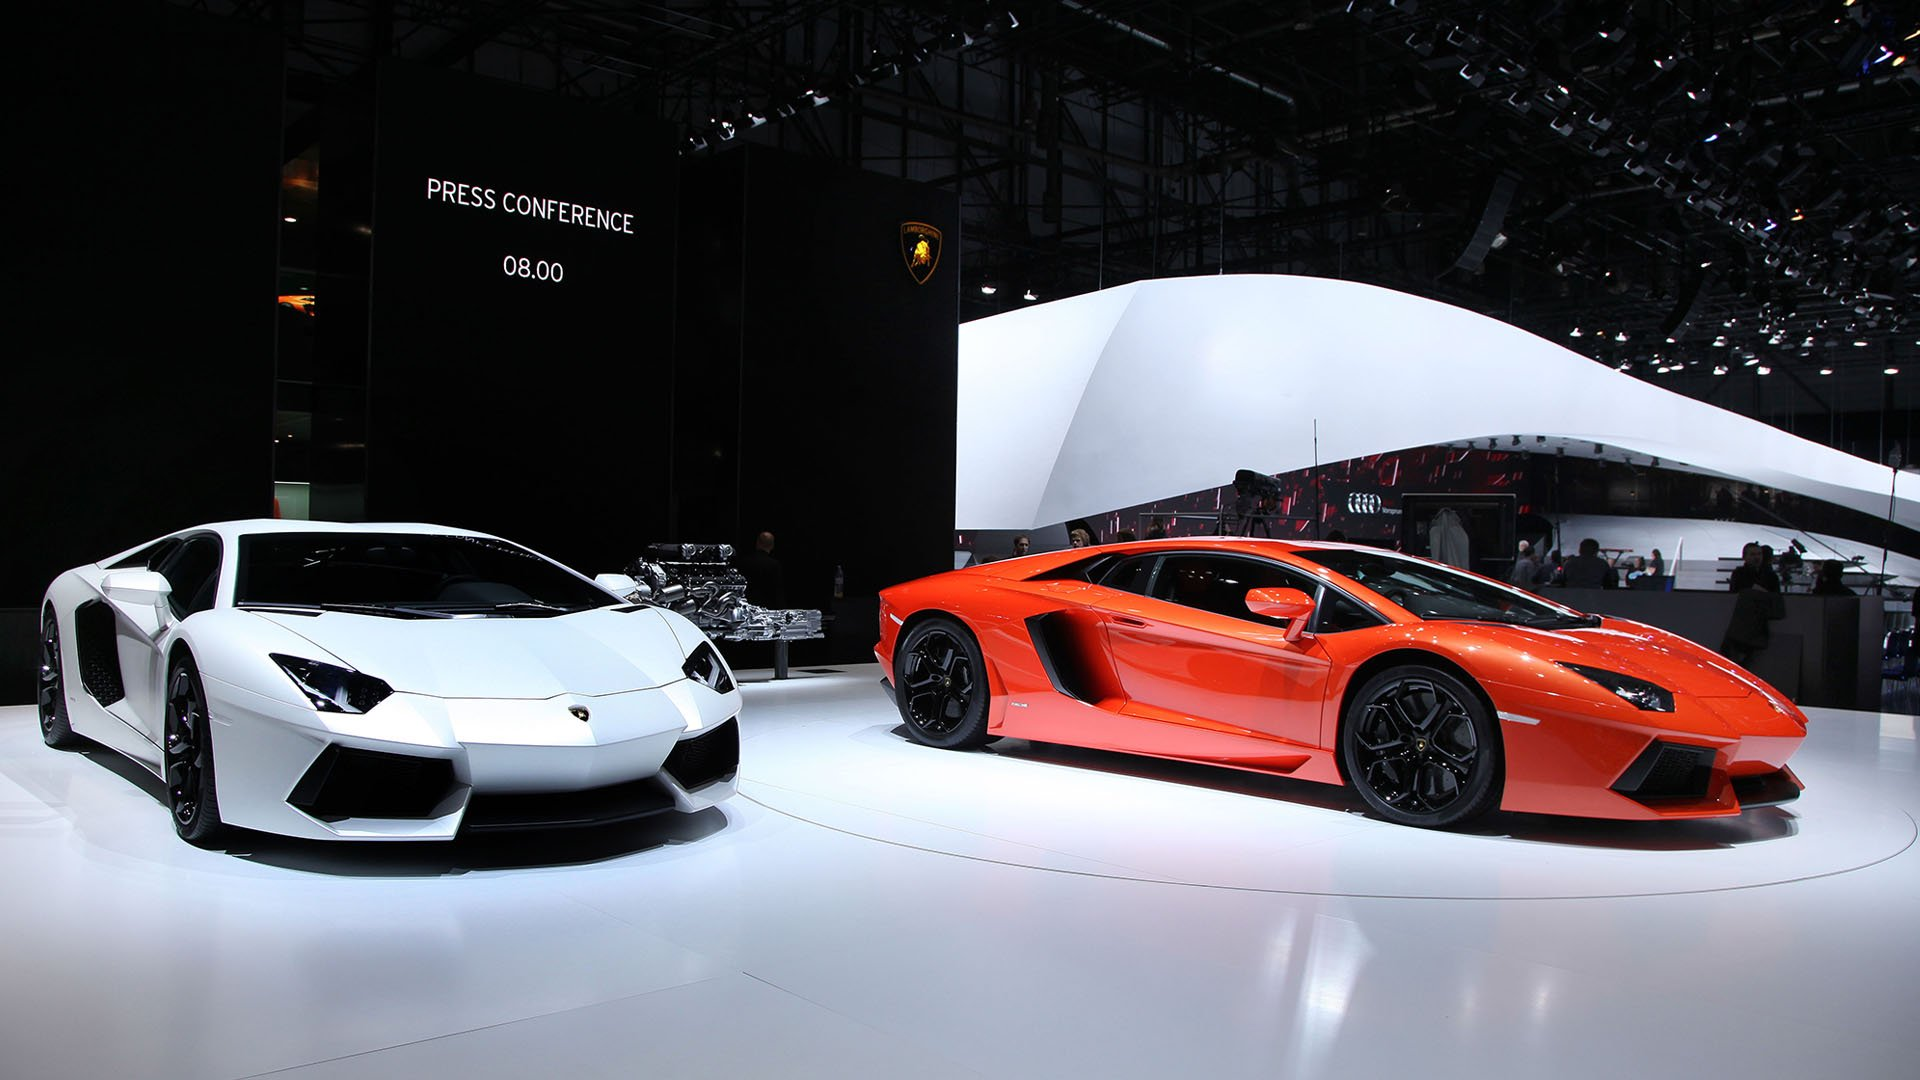 White and orange Lamborghini Aventador at car show